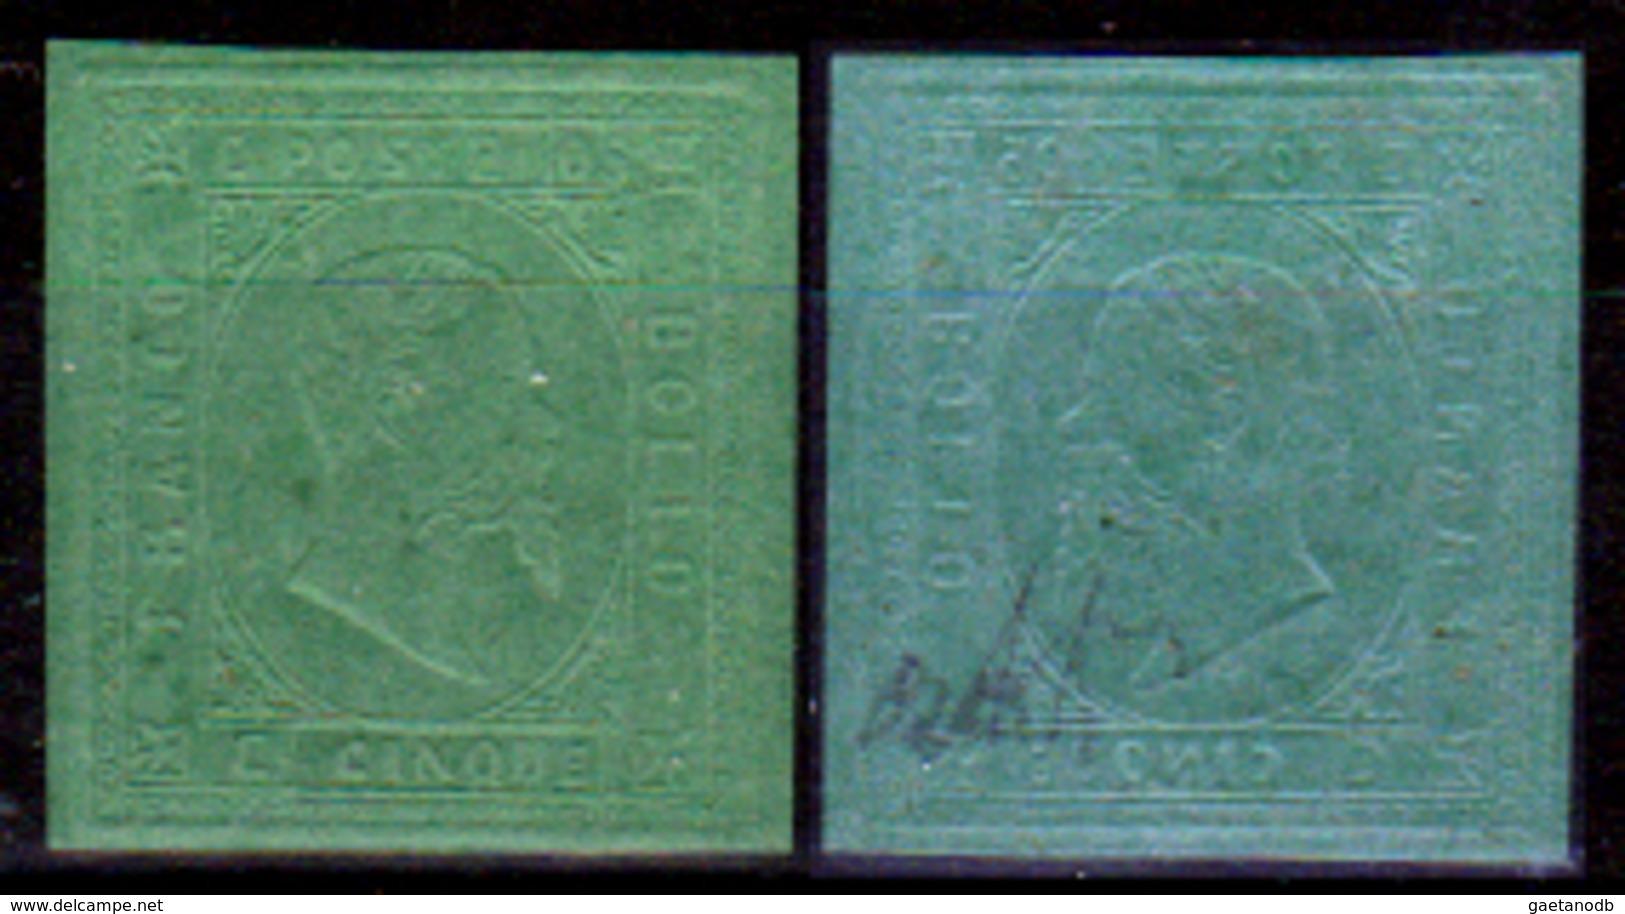 Sardegna-112 - Emissione 1853: Sassone N. 4 (+) LH - Senza Difetti Occulti. - Sardegna